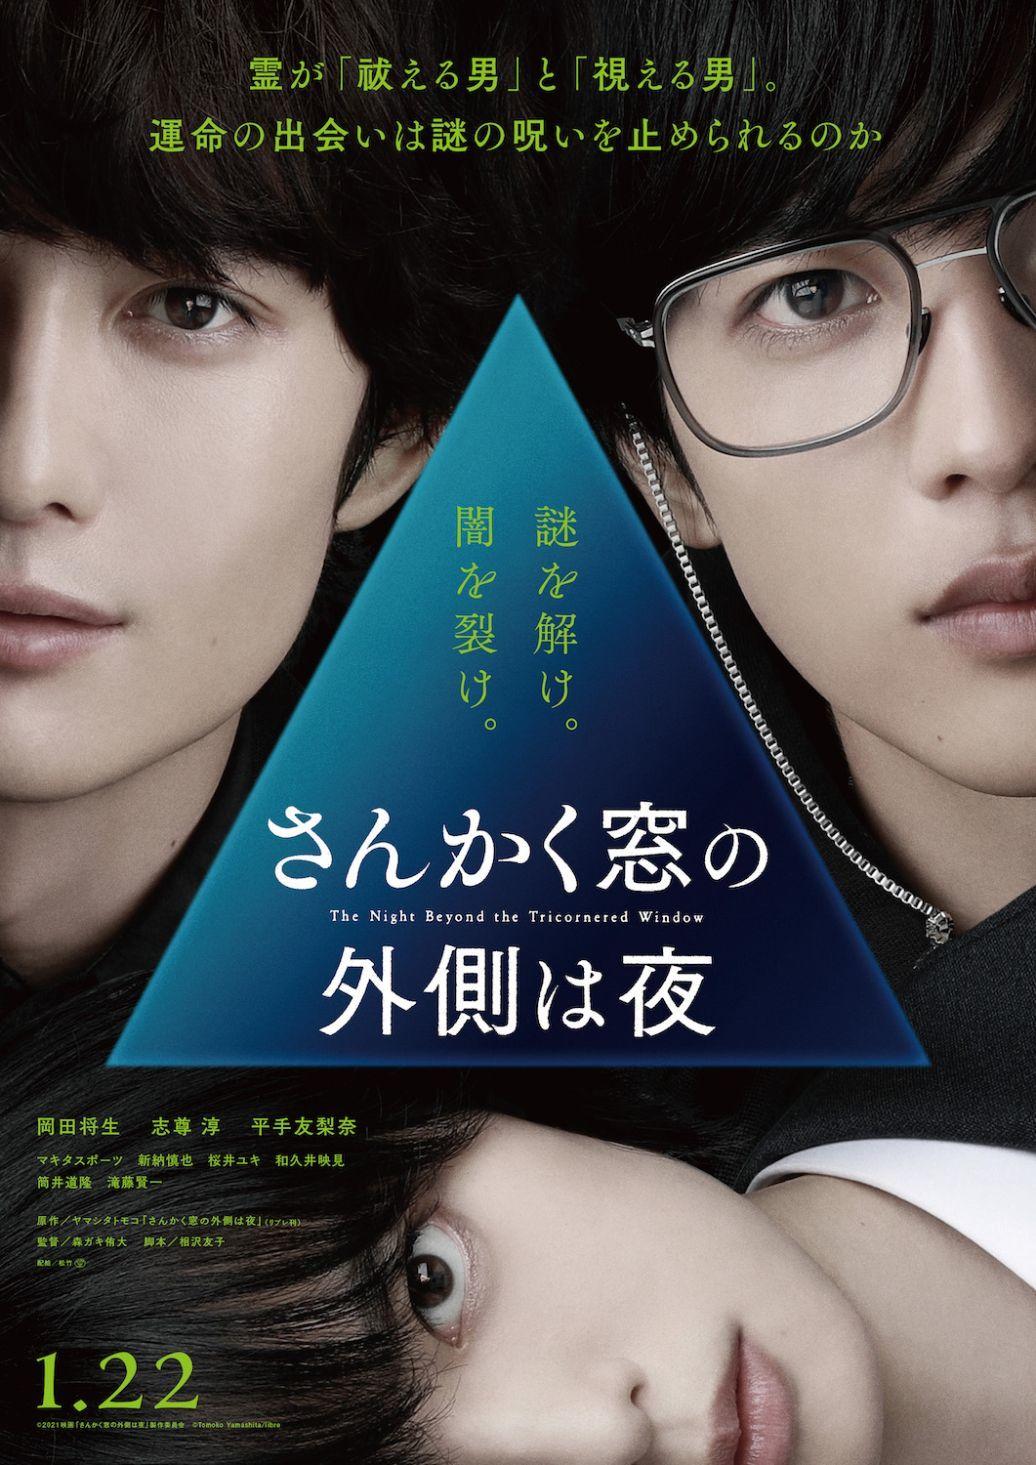 (C)2021映画「さんかく窓の外側は夜」製作委員会 (C)Tomoko Yamashita/libre